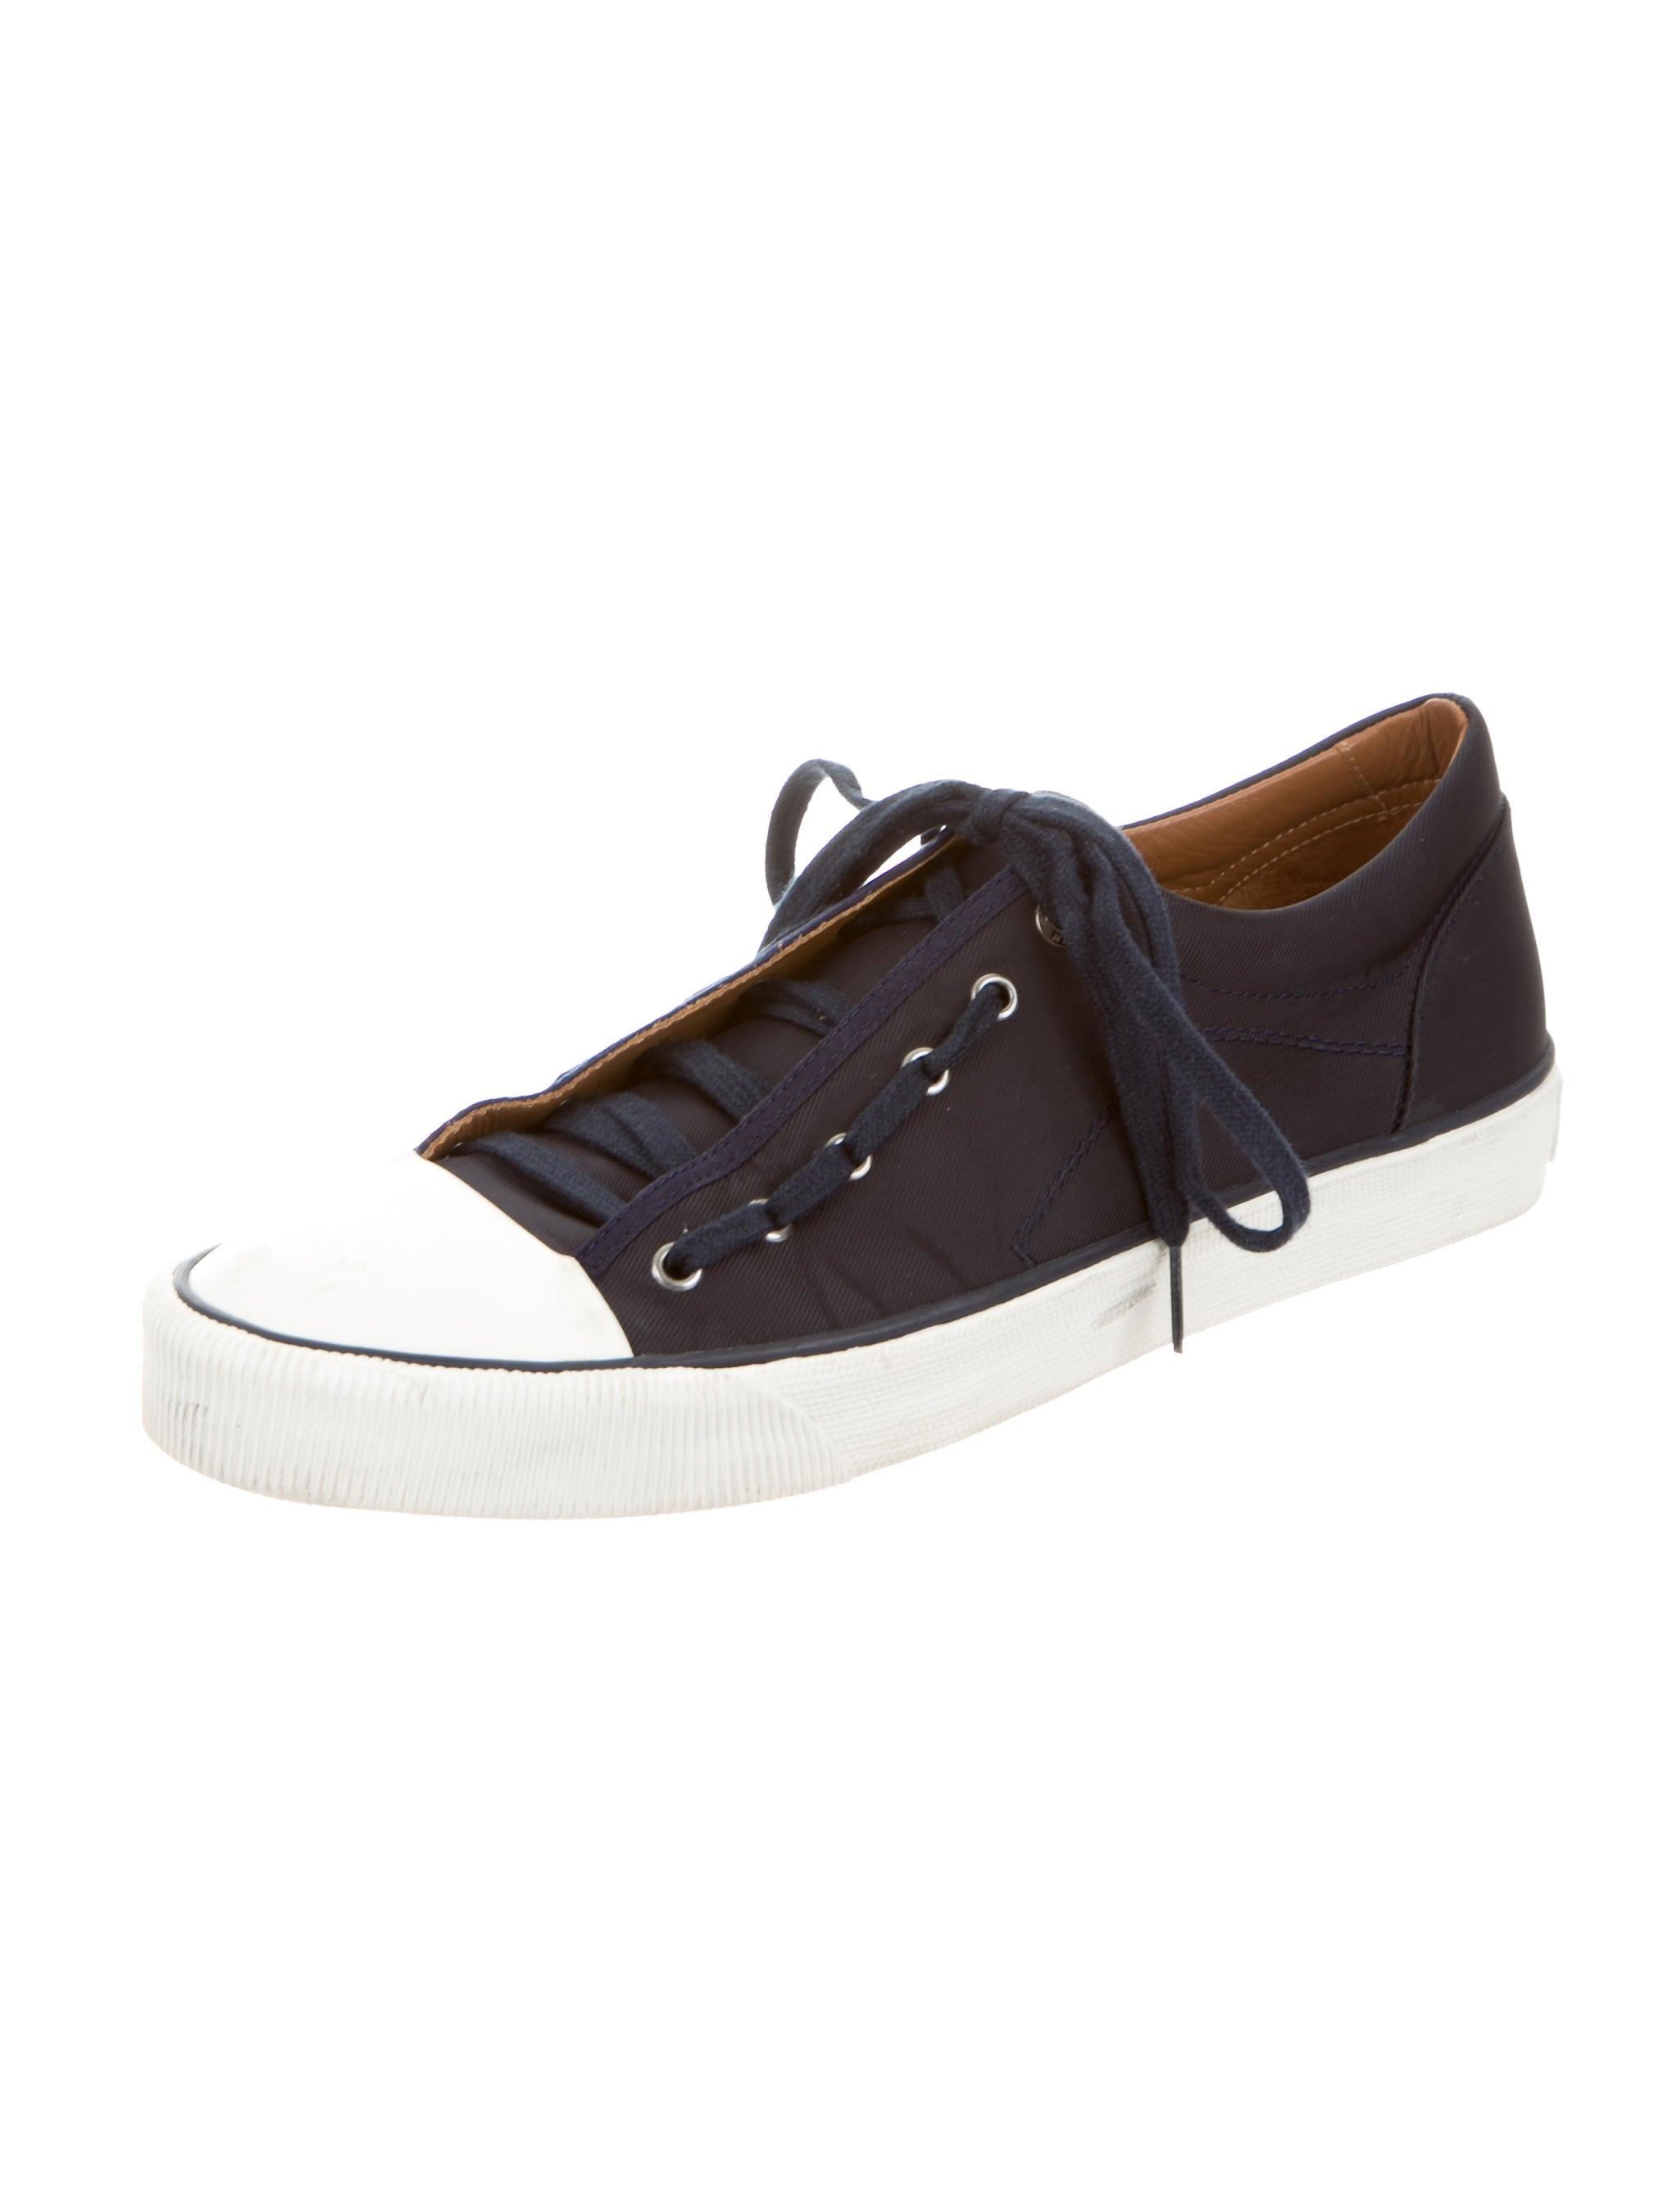 lanvin canvas low top sneakers shoes lan41339 the